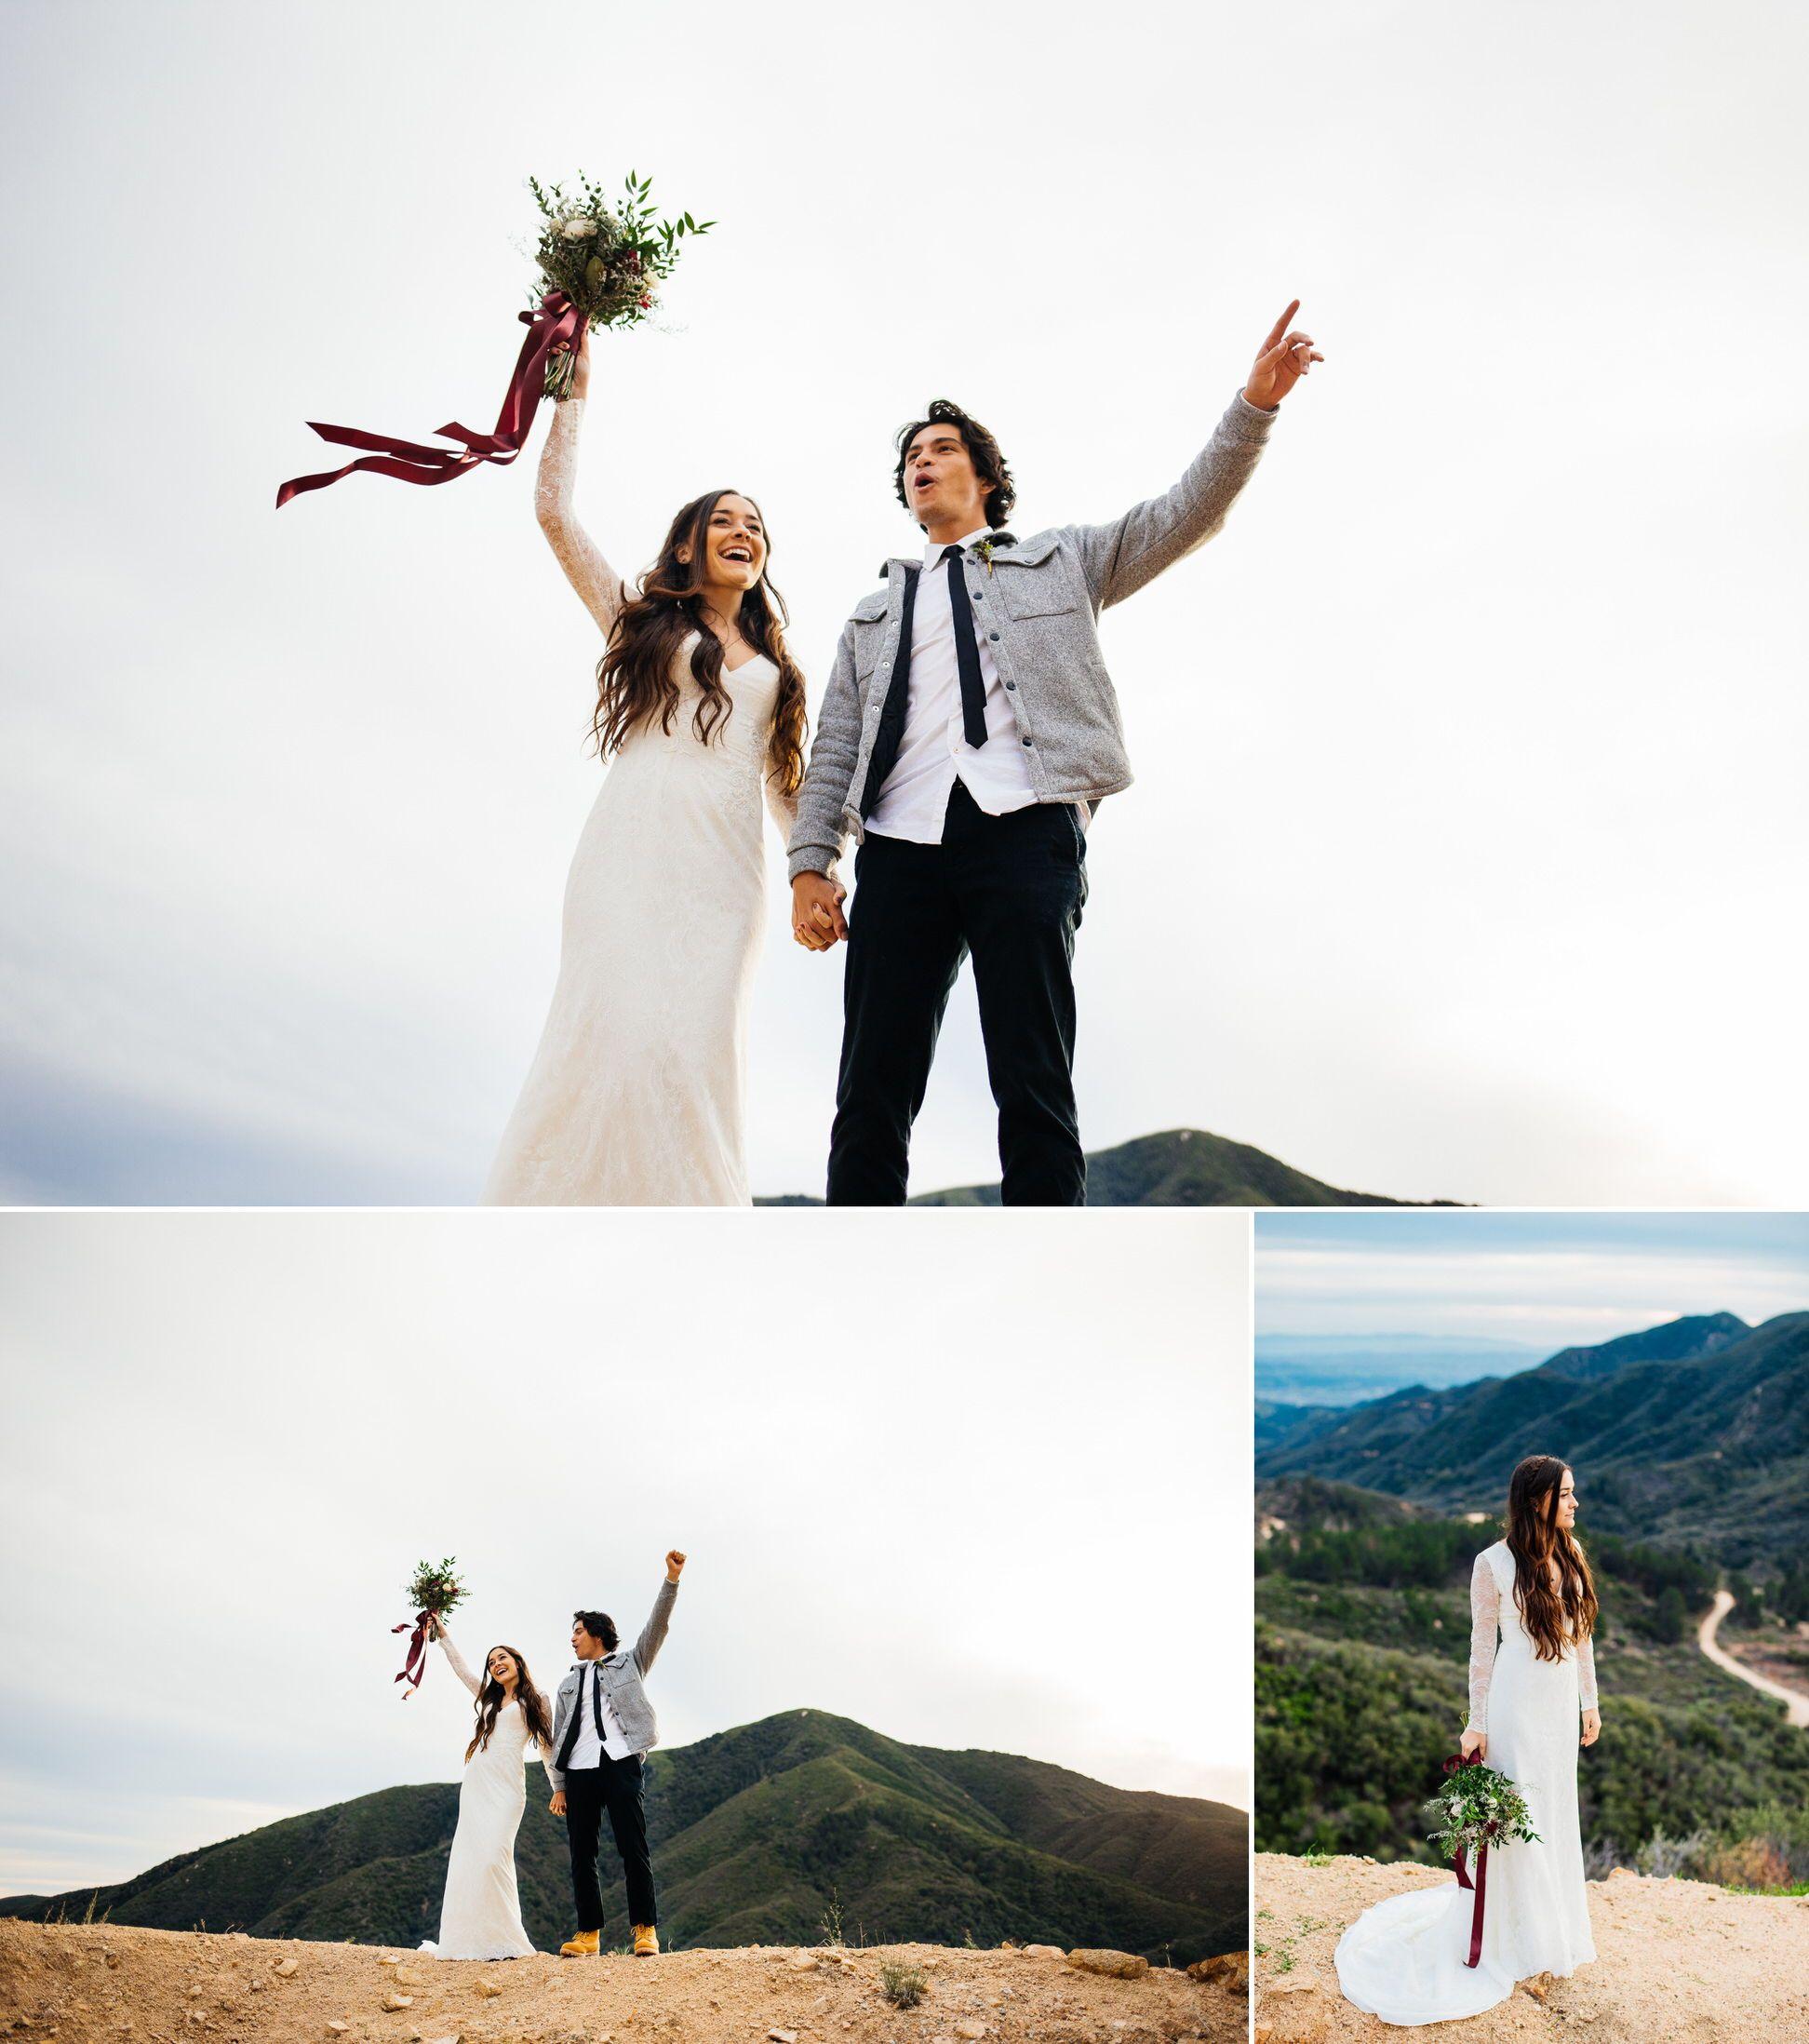 California Elopement Photographer California Elopement Photography Califo Intimate Wedding Photographer Destination Wedding Photographer California Elopement